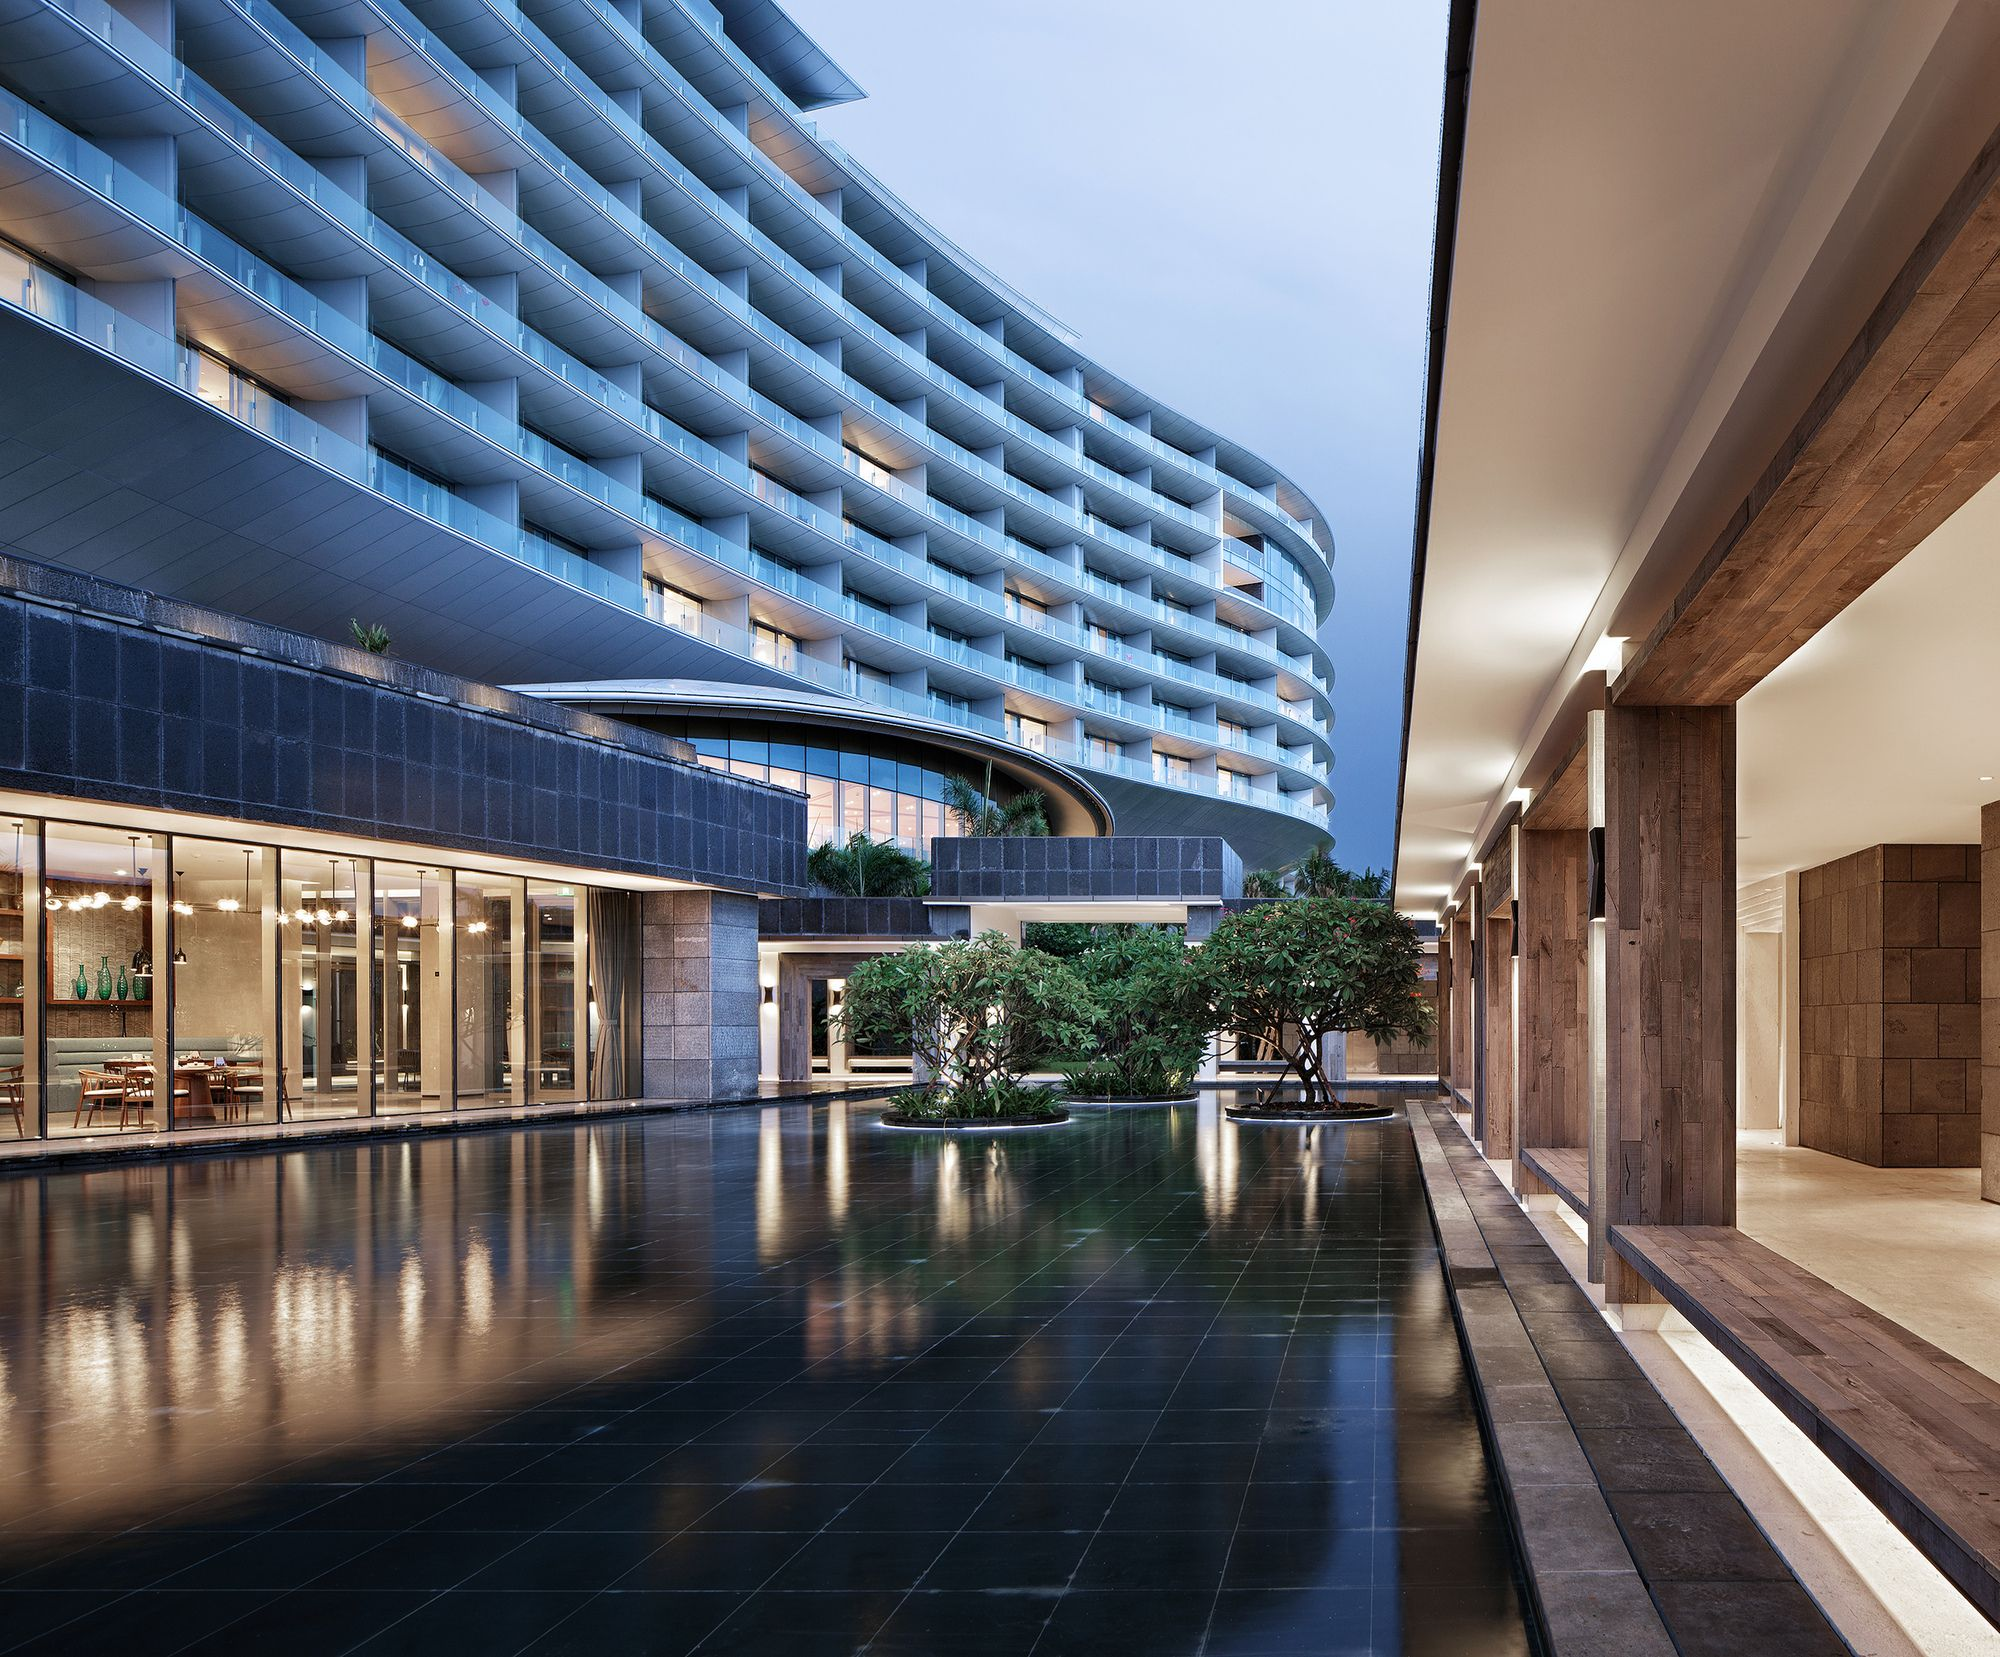 Gallery of hainan blue bay westin resort hotel gad 2 building - Bay architecture ...